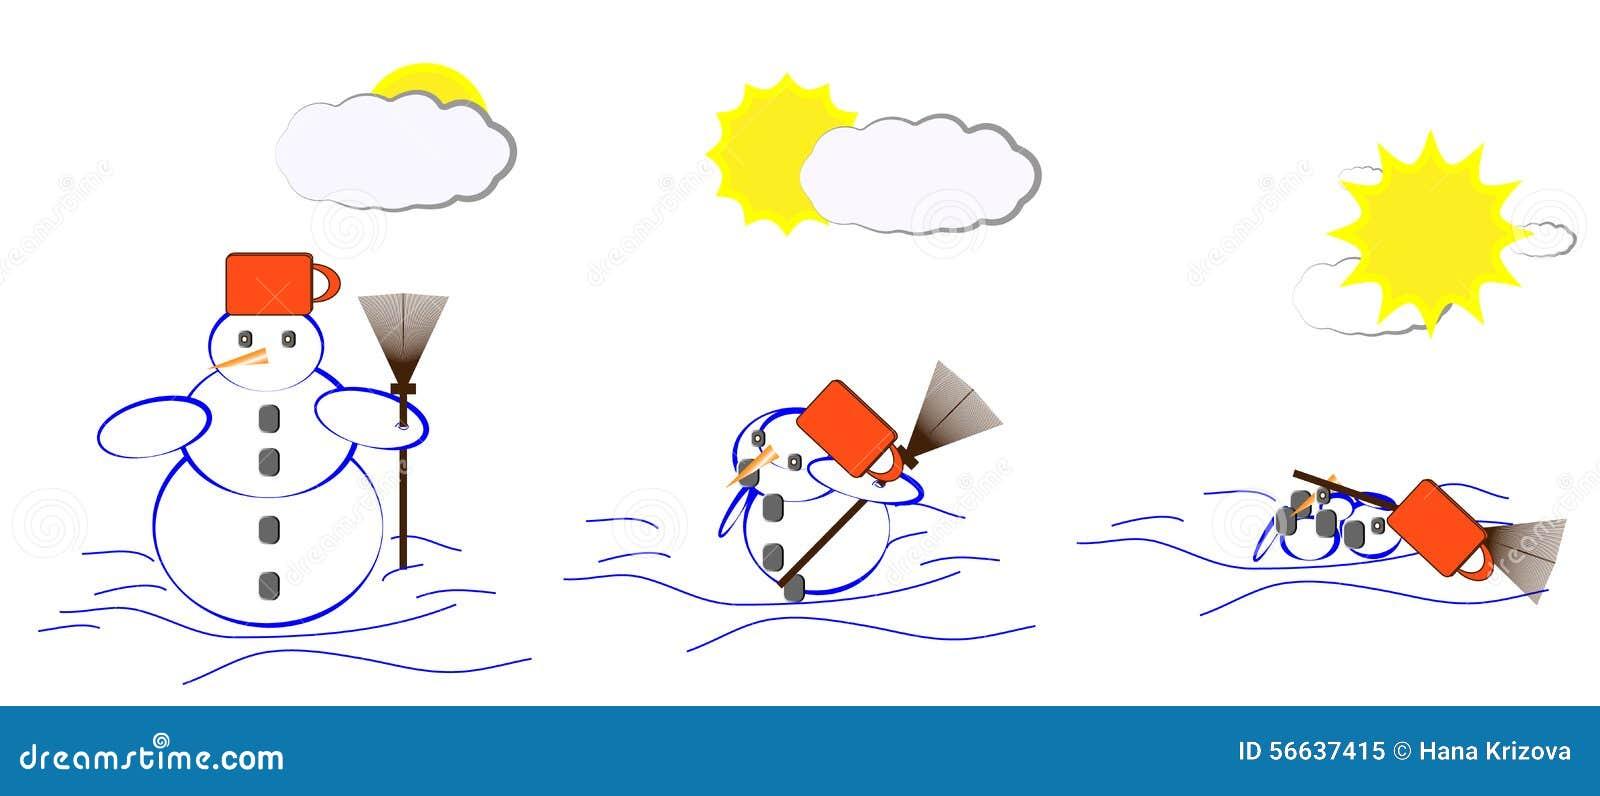 Melting Snowman Stock Illustrations – 107 Melting Snowman Stock ... for Melting Snowman Clipart  35fsj